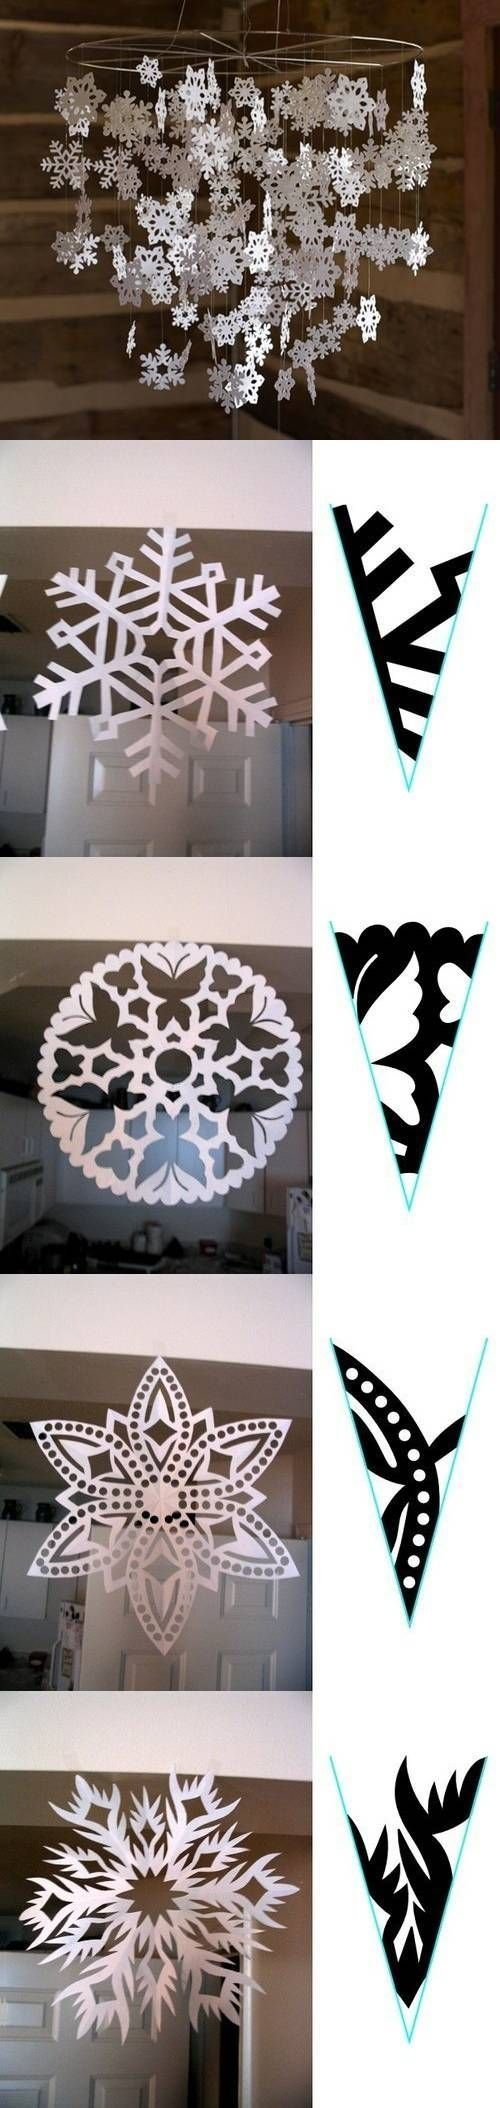 Paper snow flakes 2